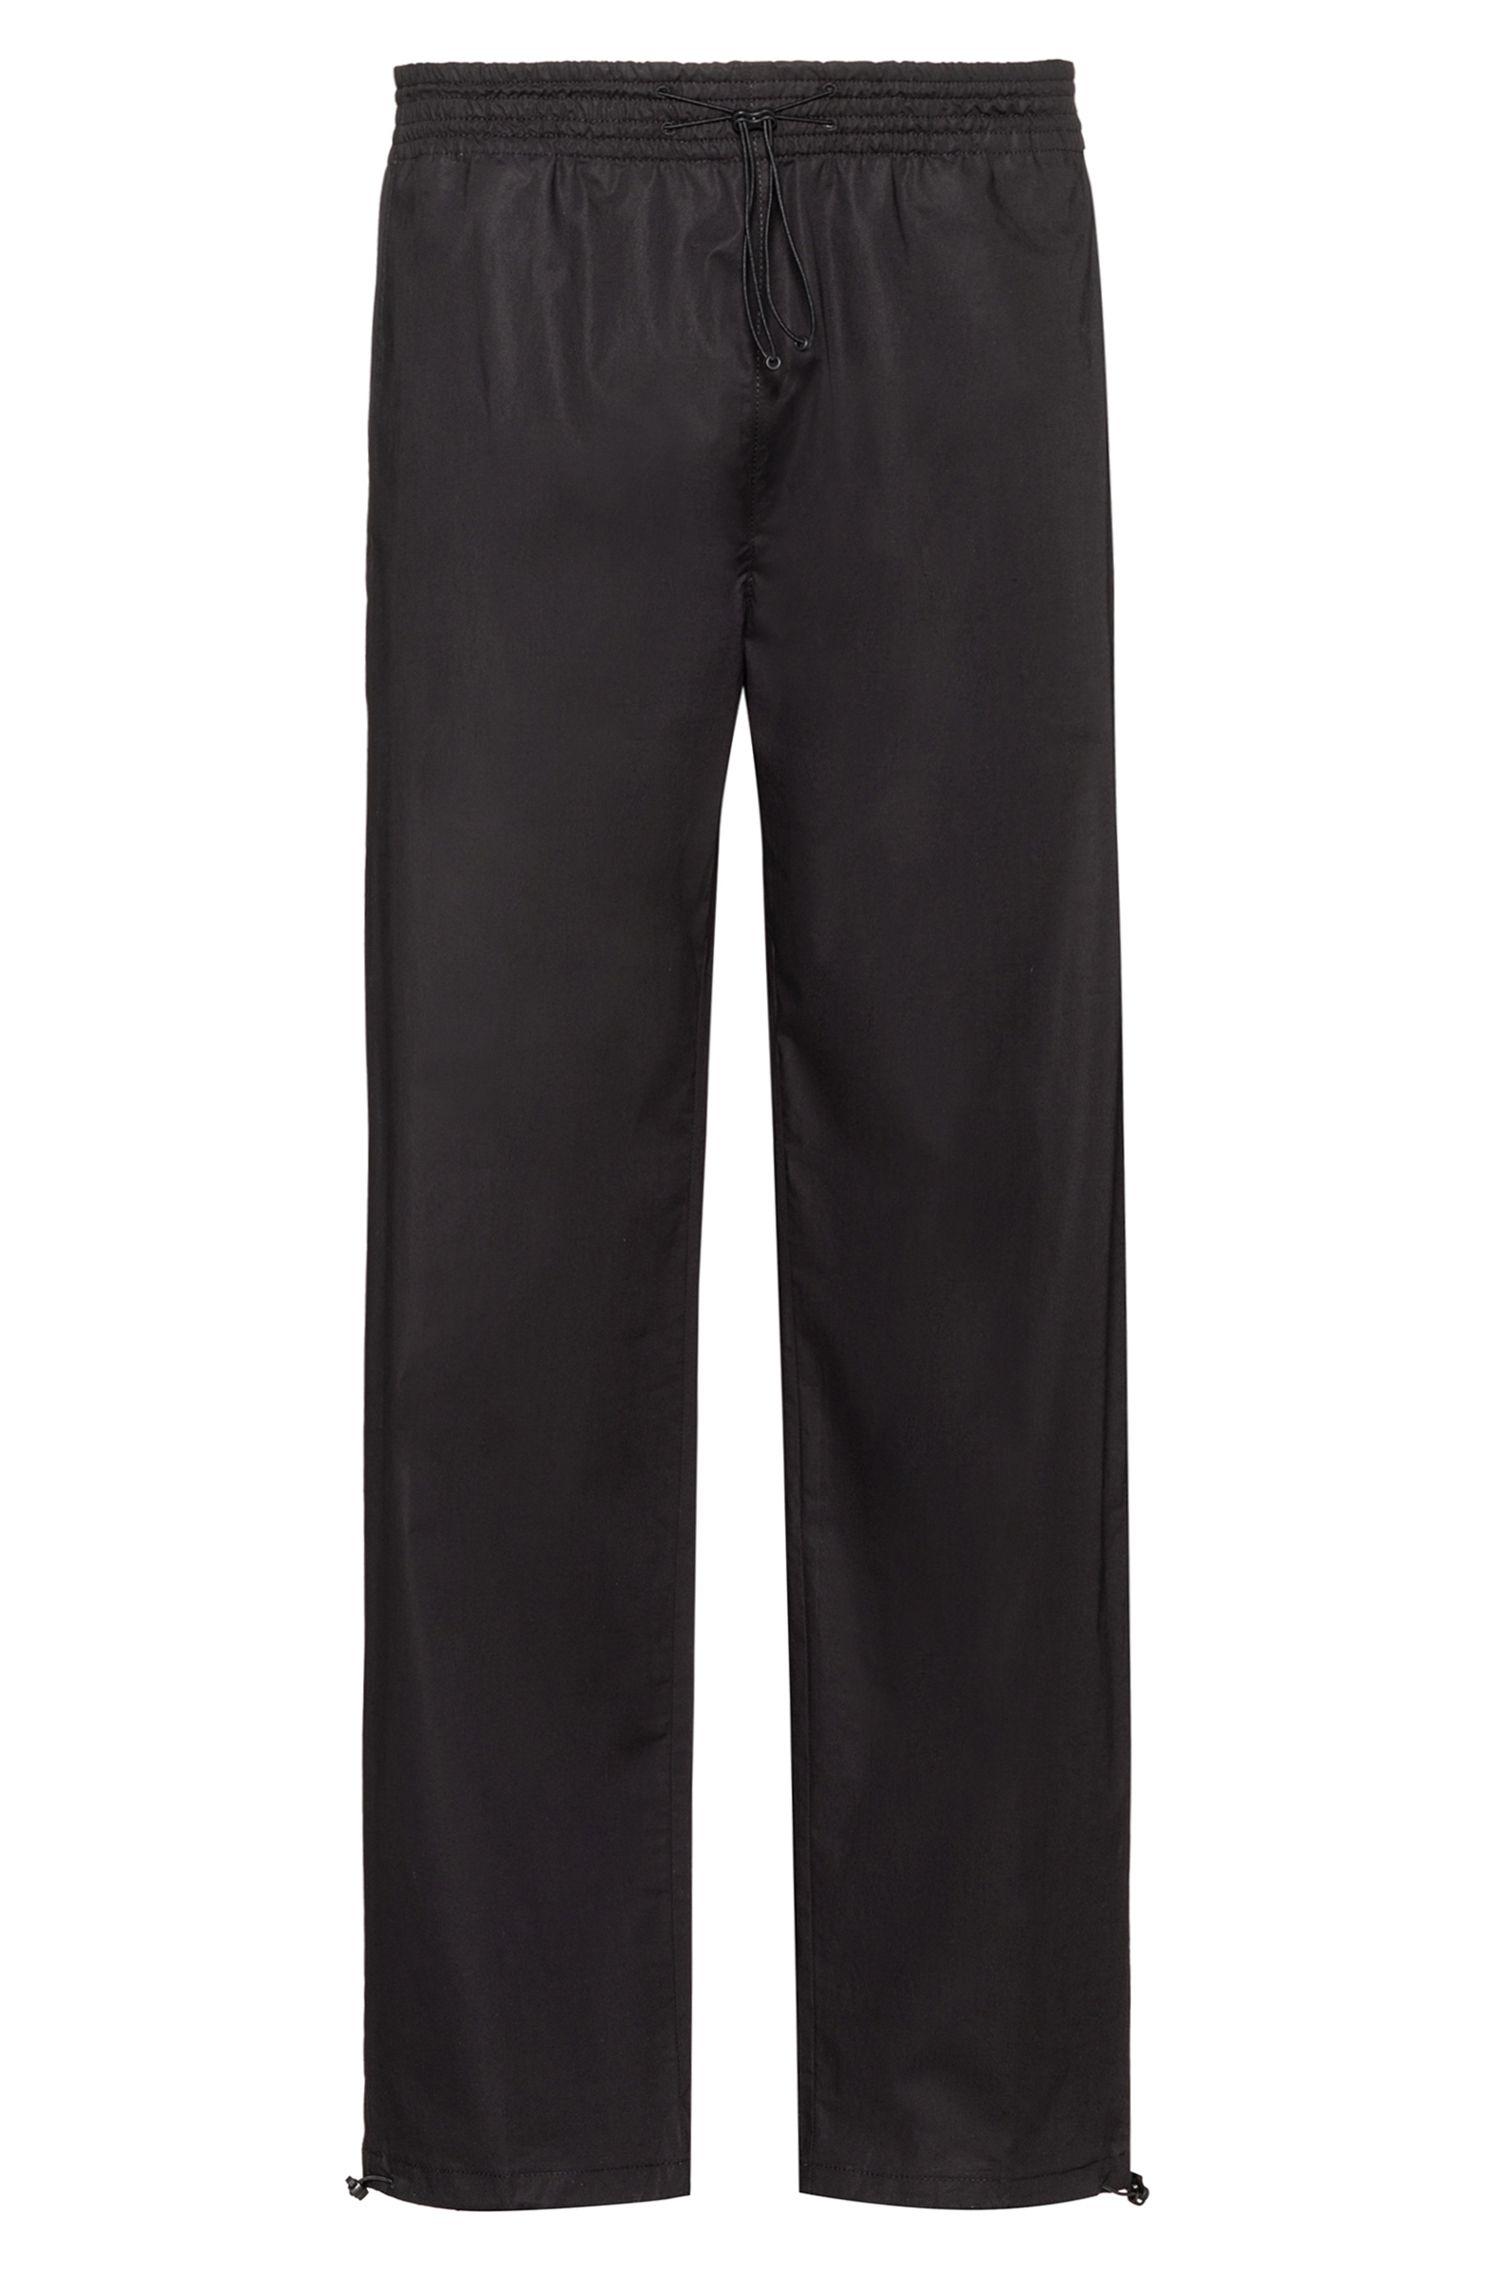 Straight-leg pants with elastic waistband and hems, Black